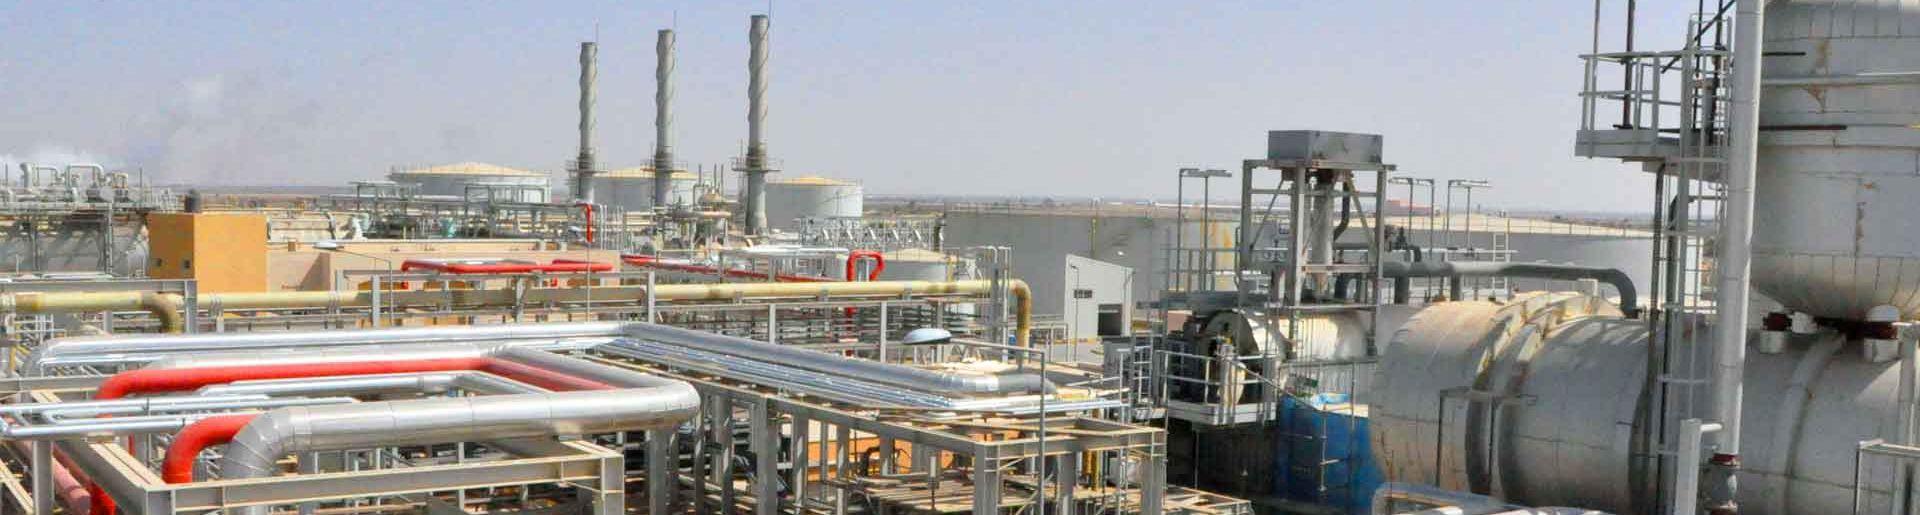 Zuara Desalination Plant Project